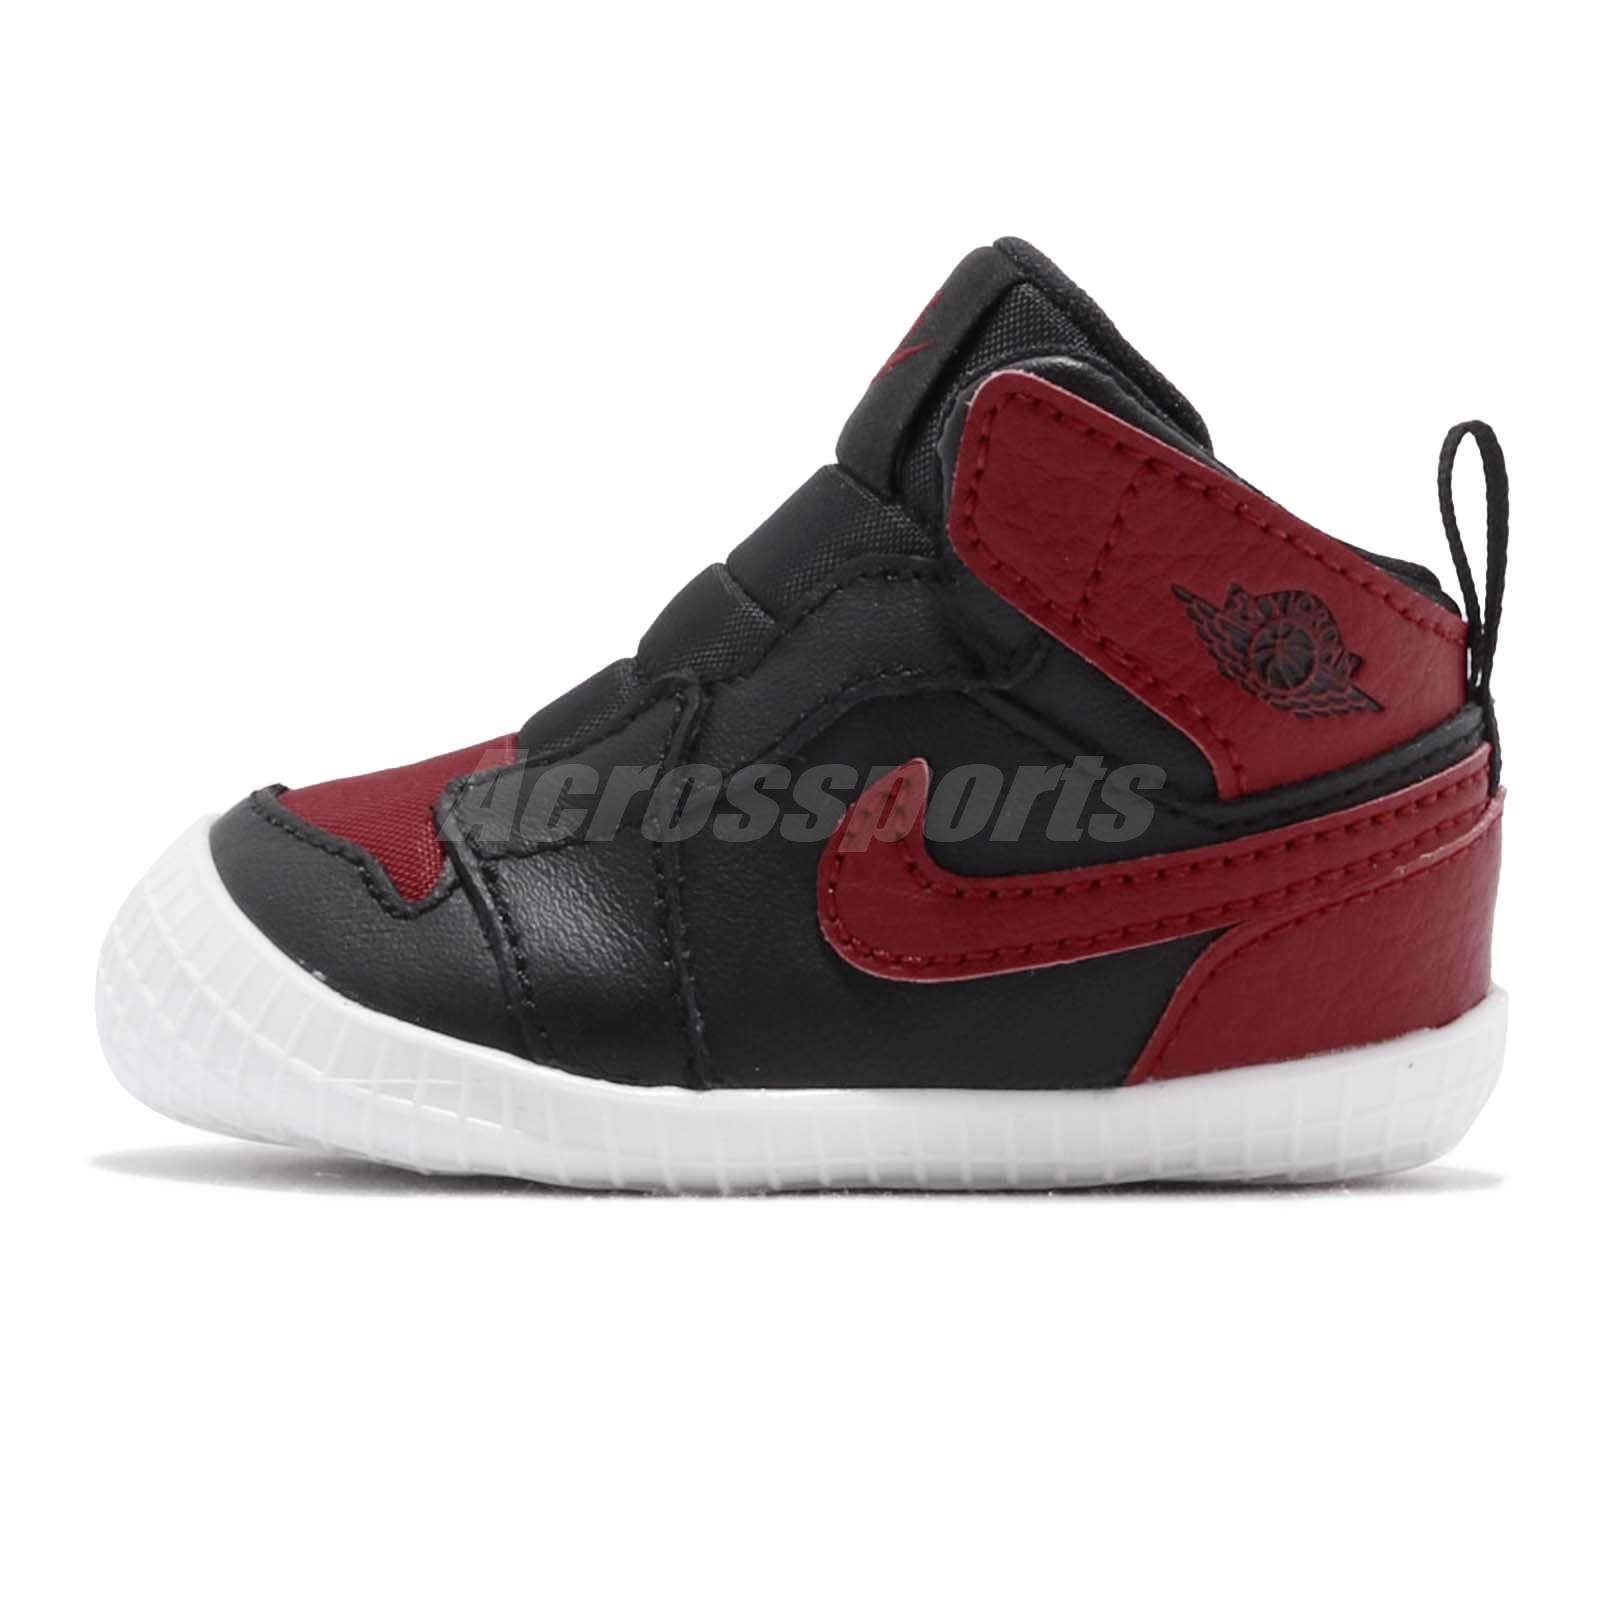 1a16e663b Details about Nike Jordan 1 CRIB Bootie I AJ1 Bred Black Red TD Toddler  Infant Shoe AT3745-023